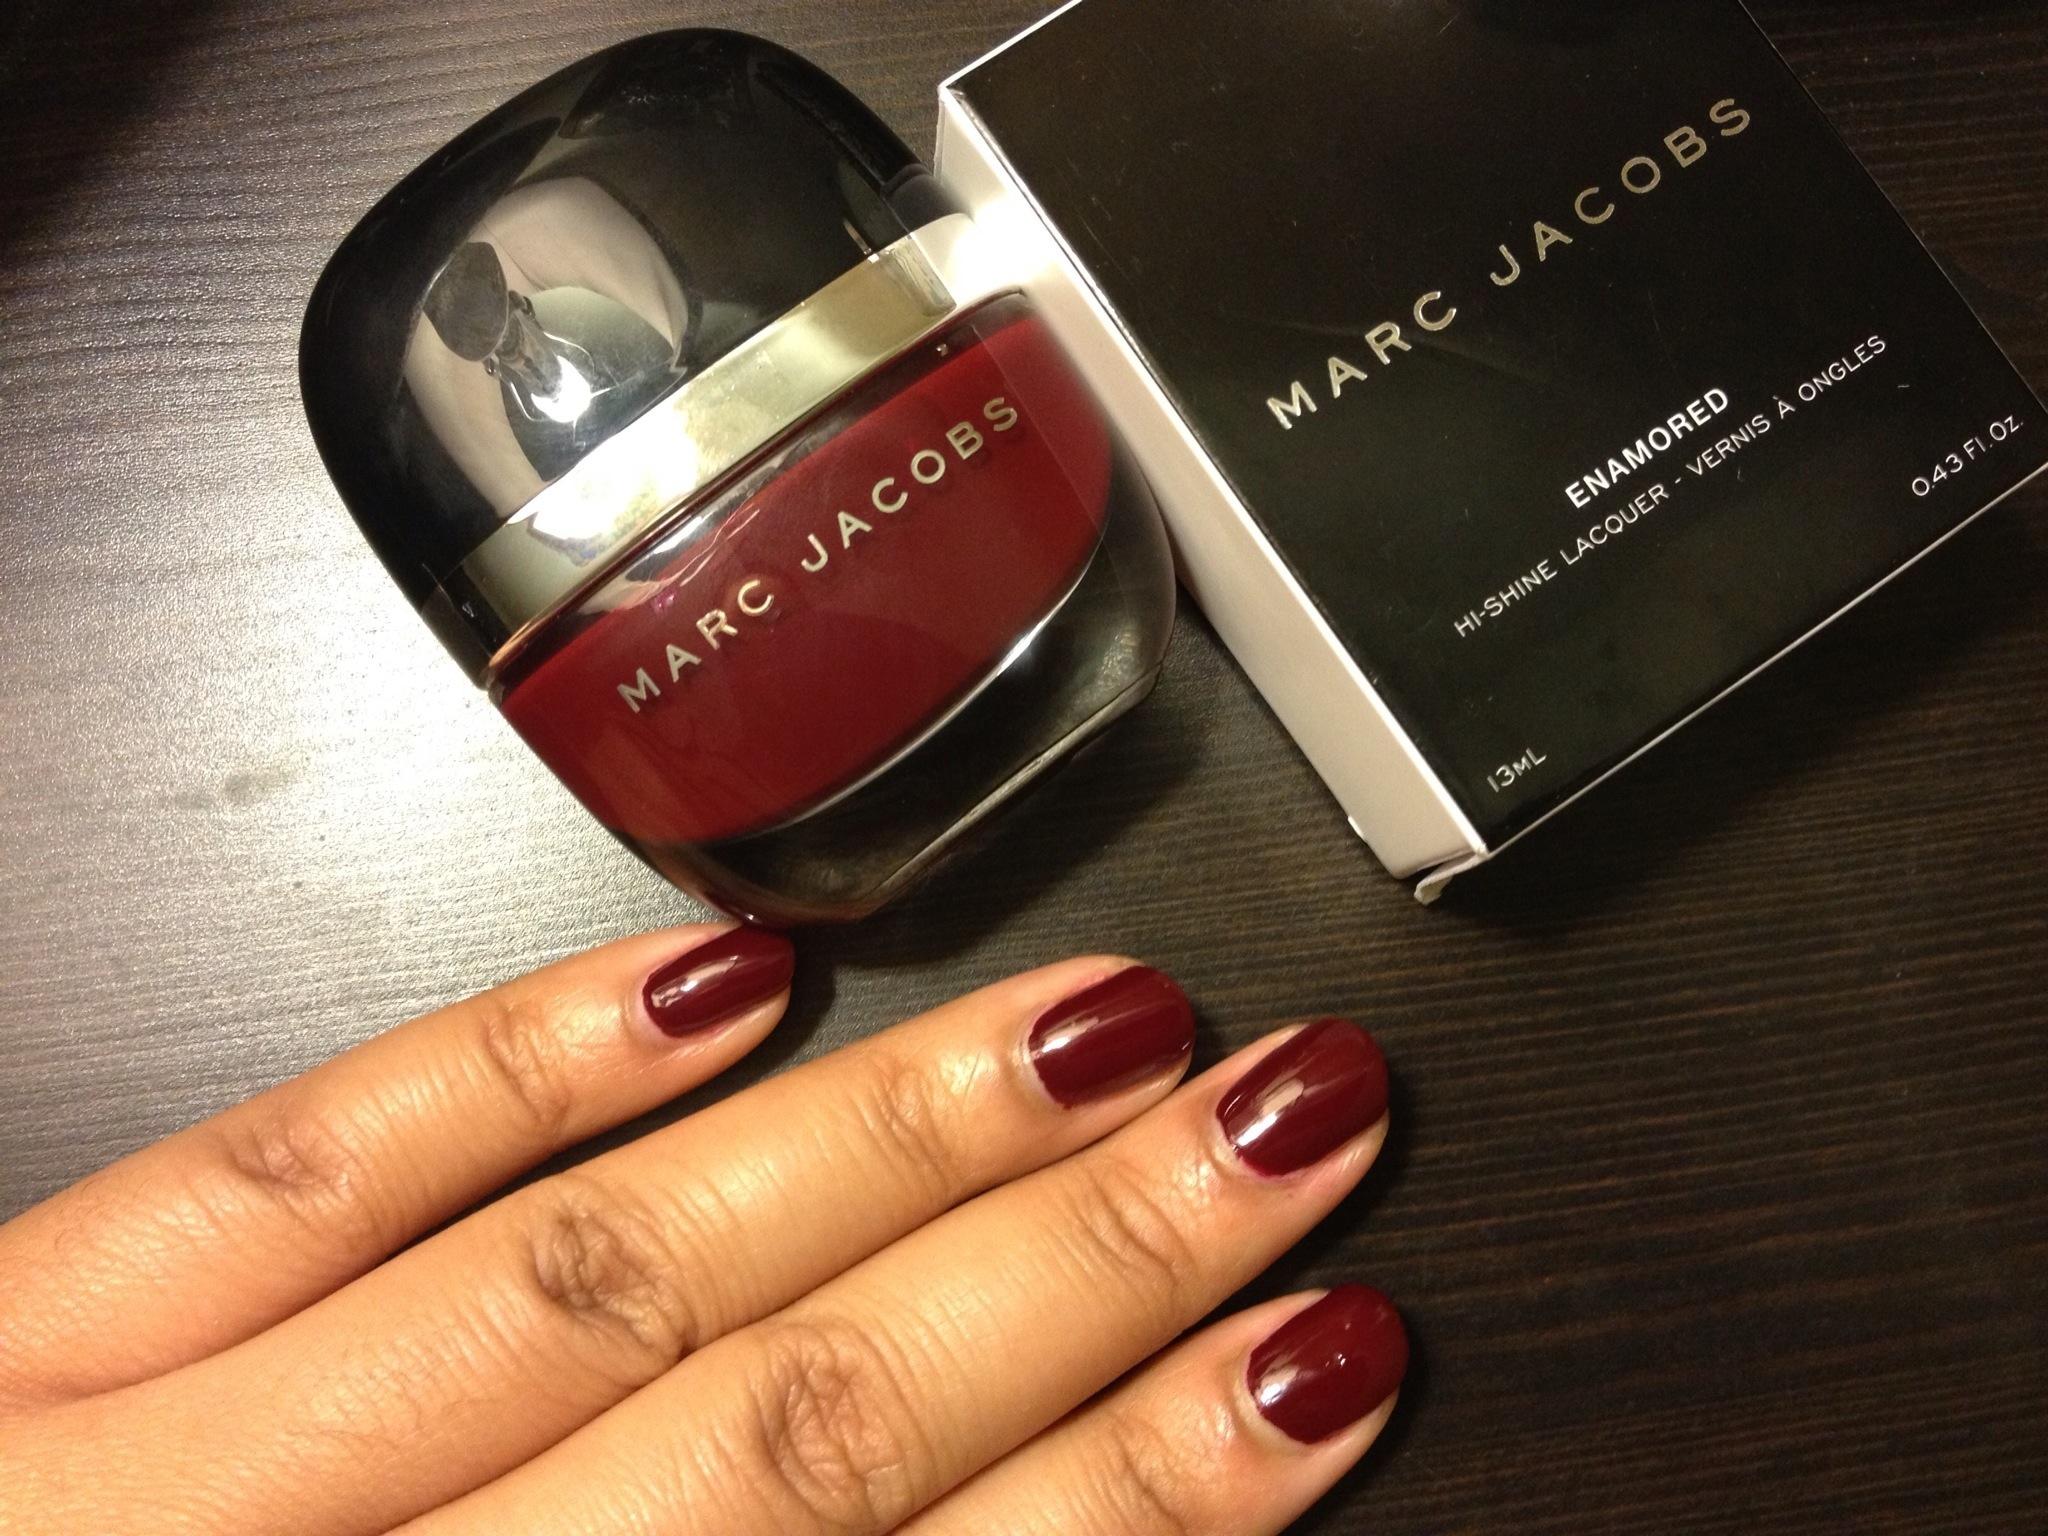 marc-jacobs-nail-polish-swatches-jezebel